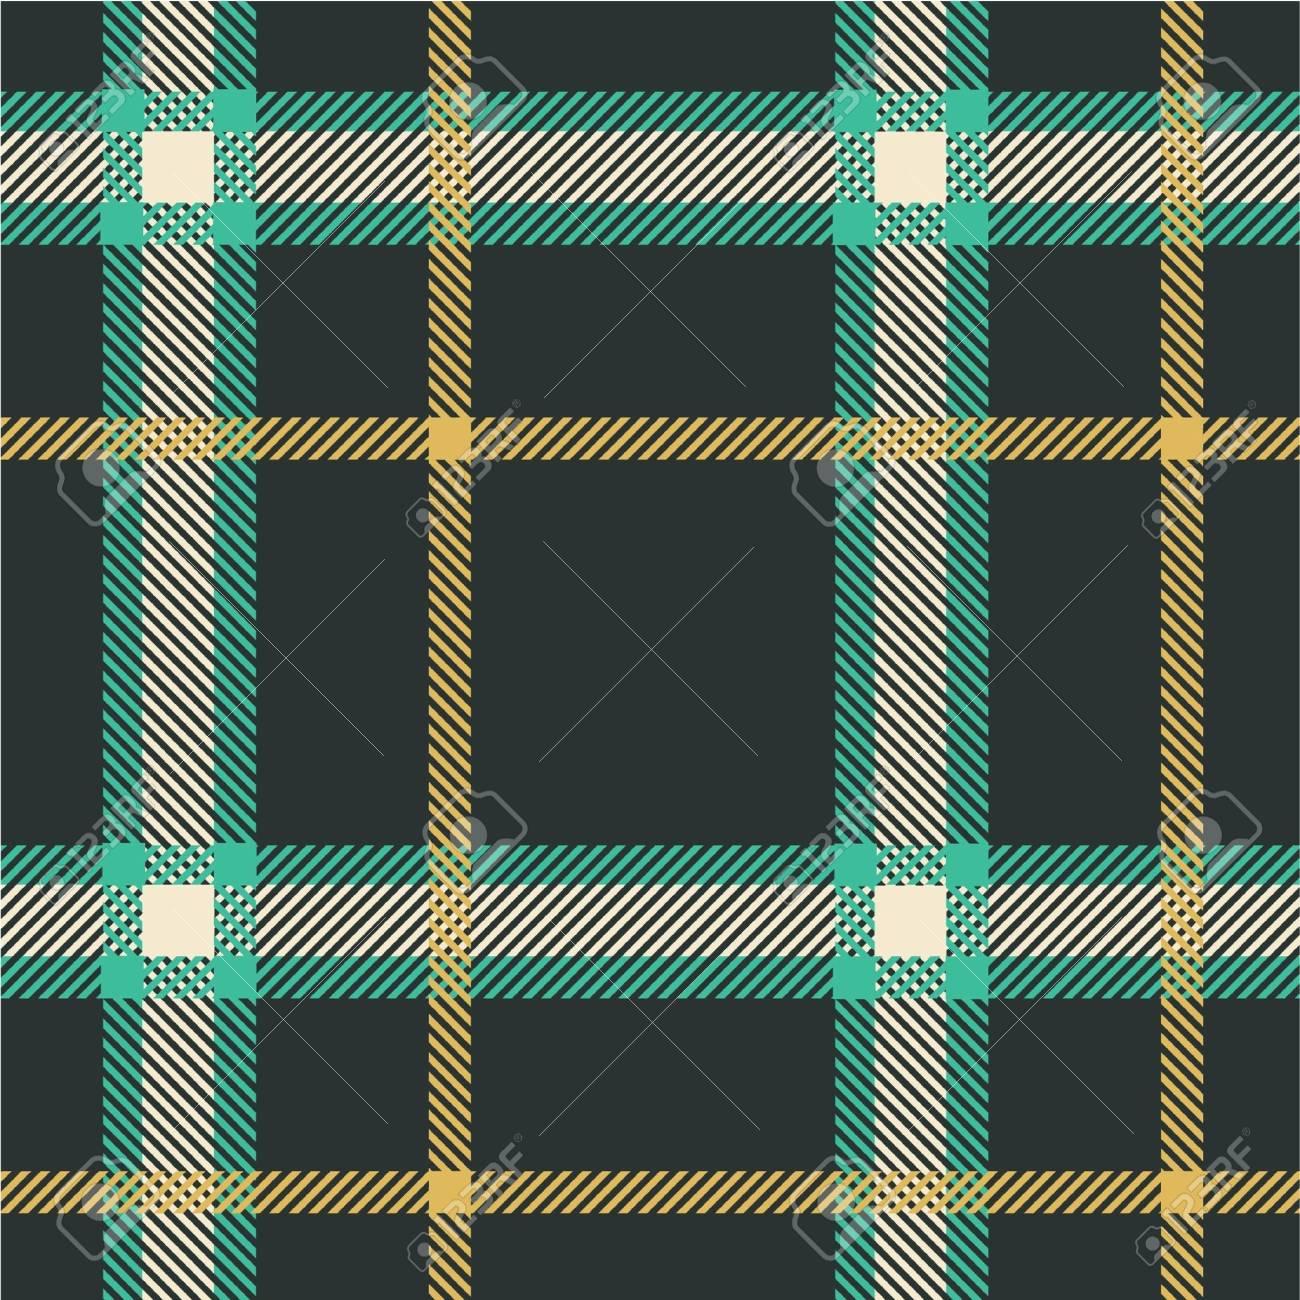 Plaid pattern - 9905292